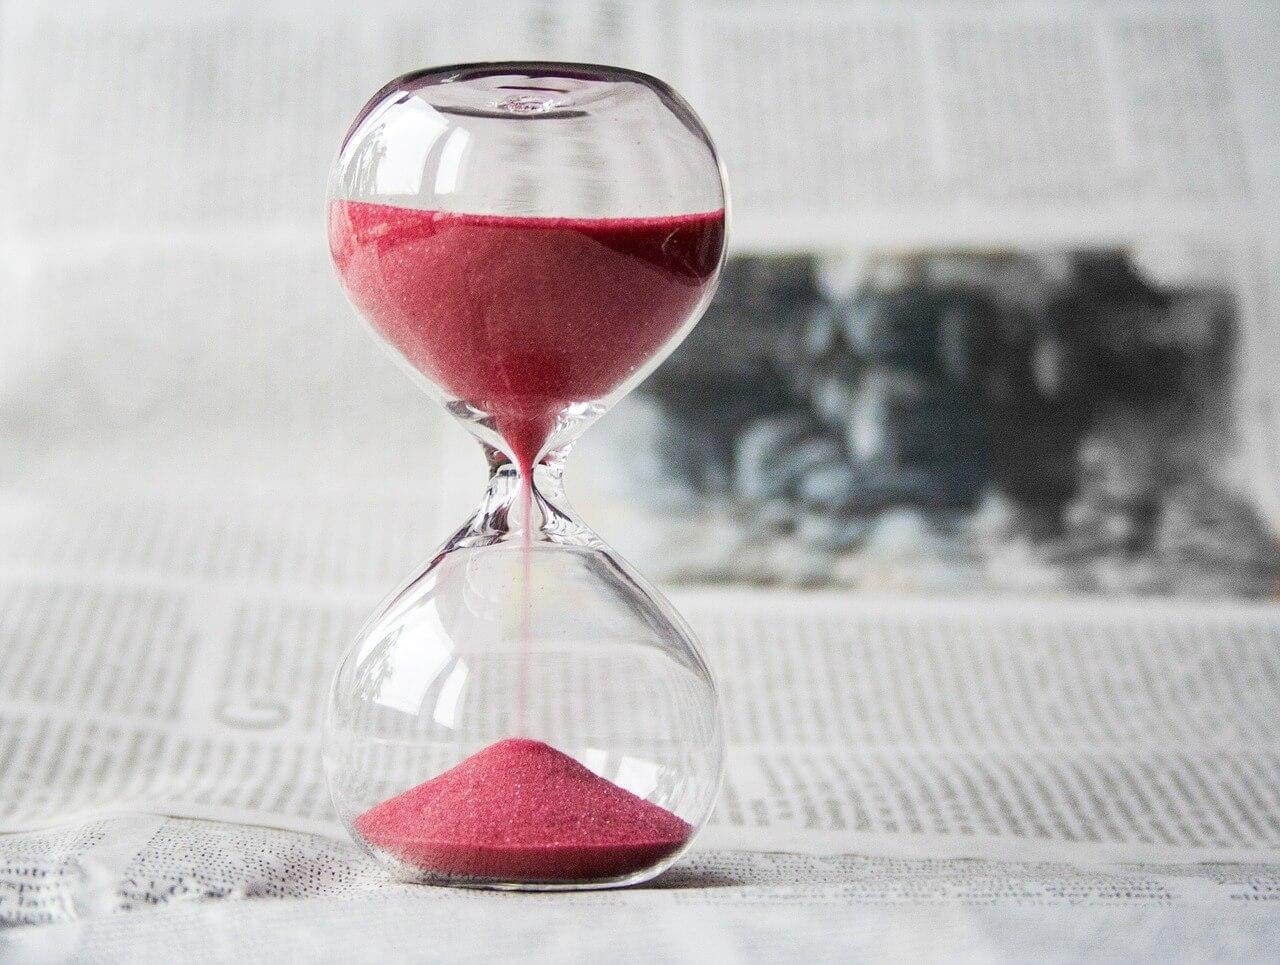 Sanduhr: Verzögerung, warten